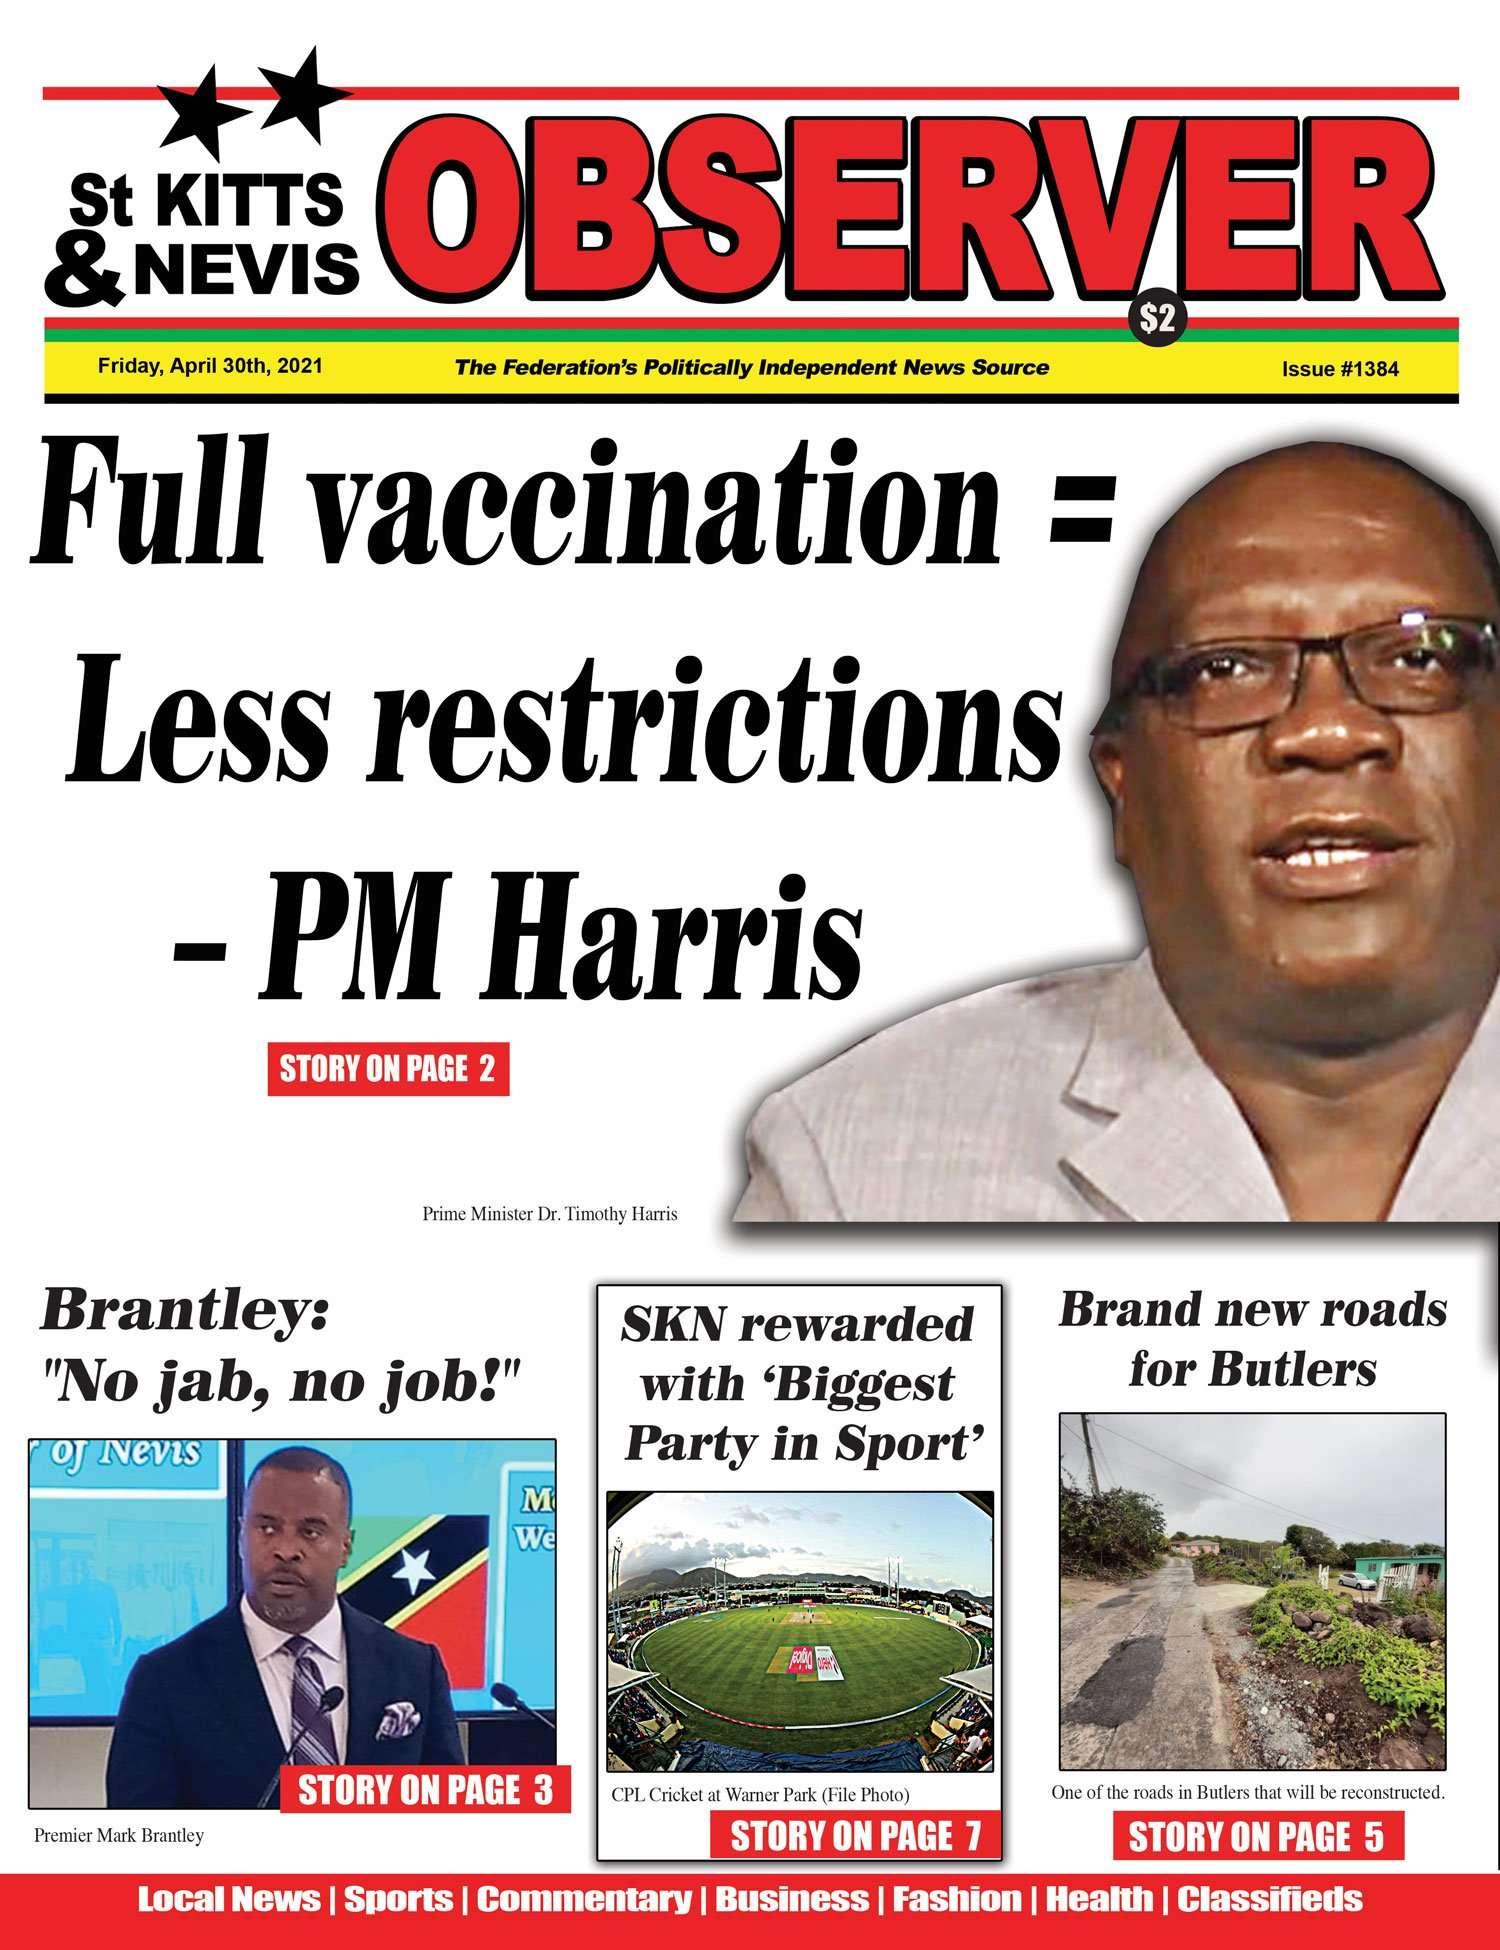 Observer Nespaper cover, april 30th, 2021